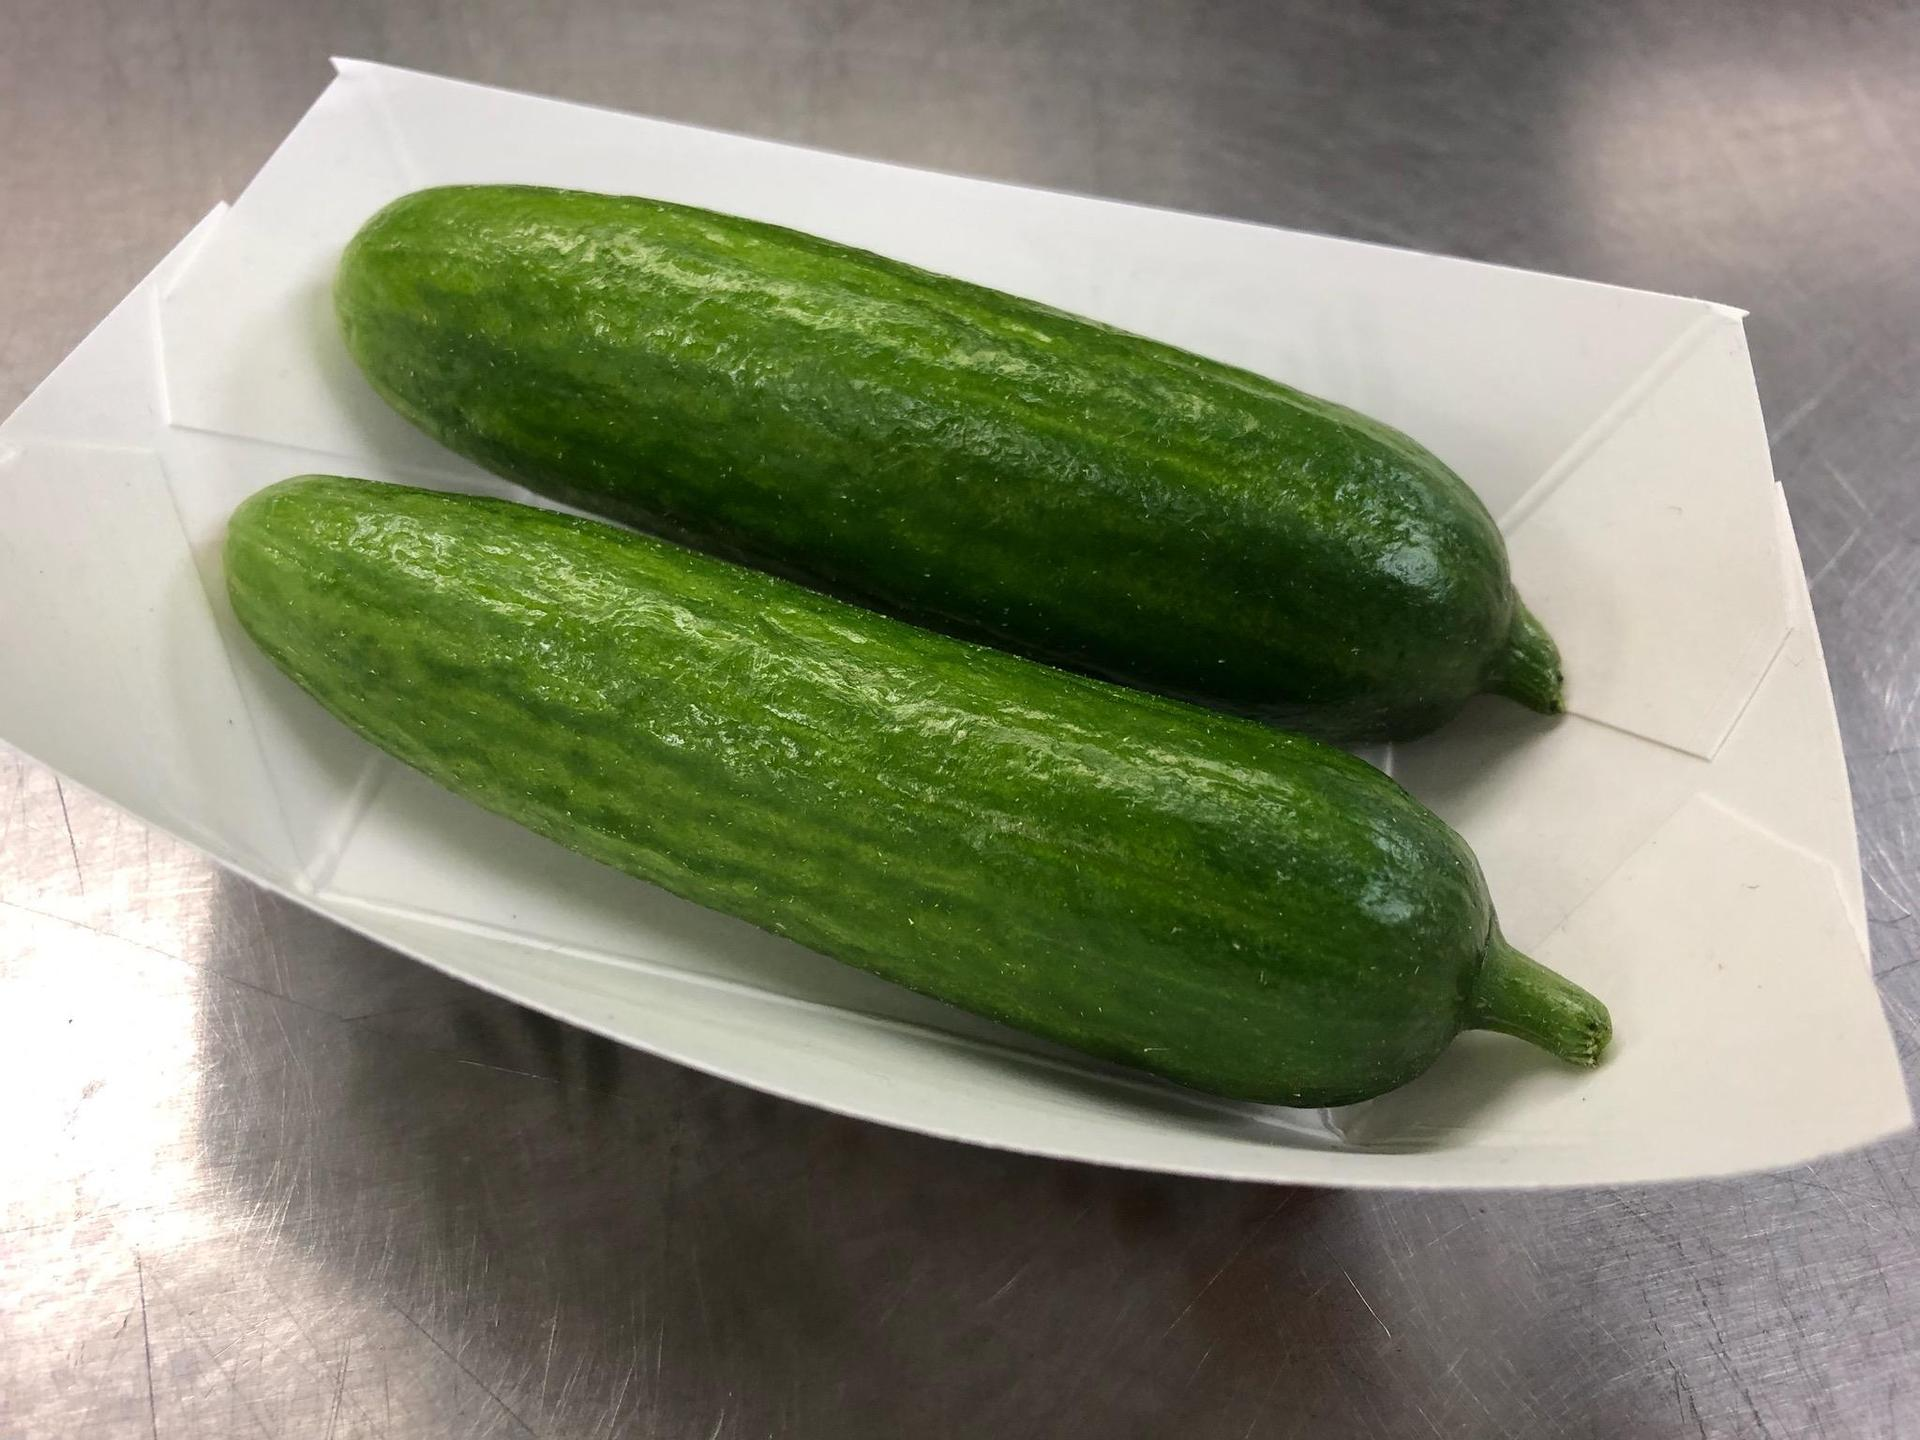 Ledgview Gardens cucumbers